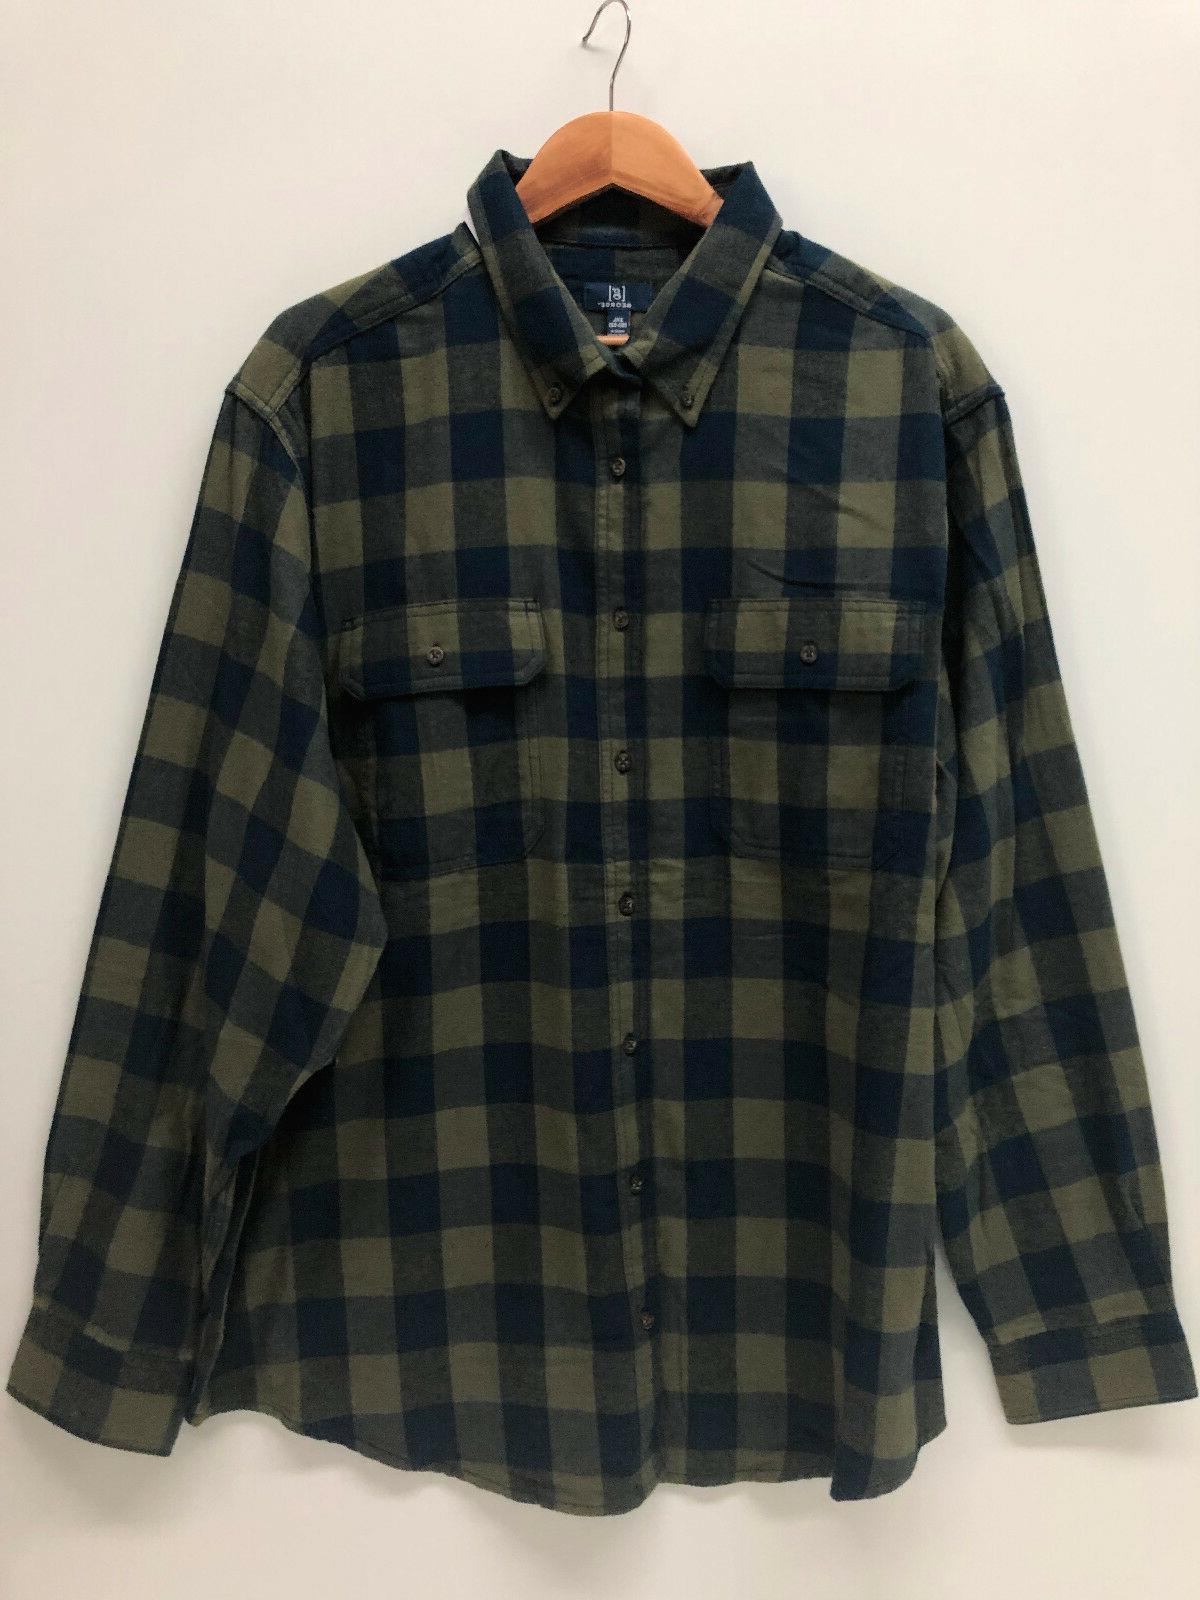 George Shirt Cotton Burgundy XL 3XL